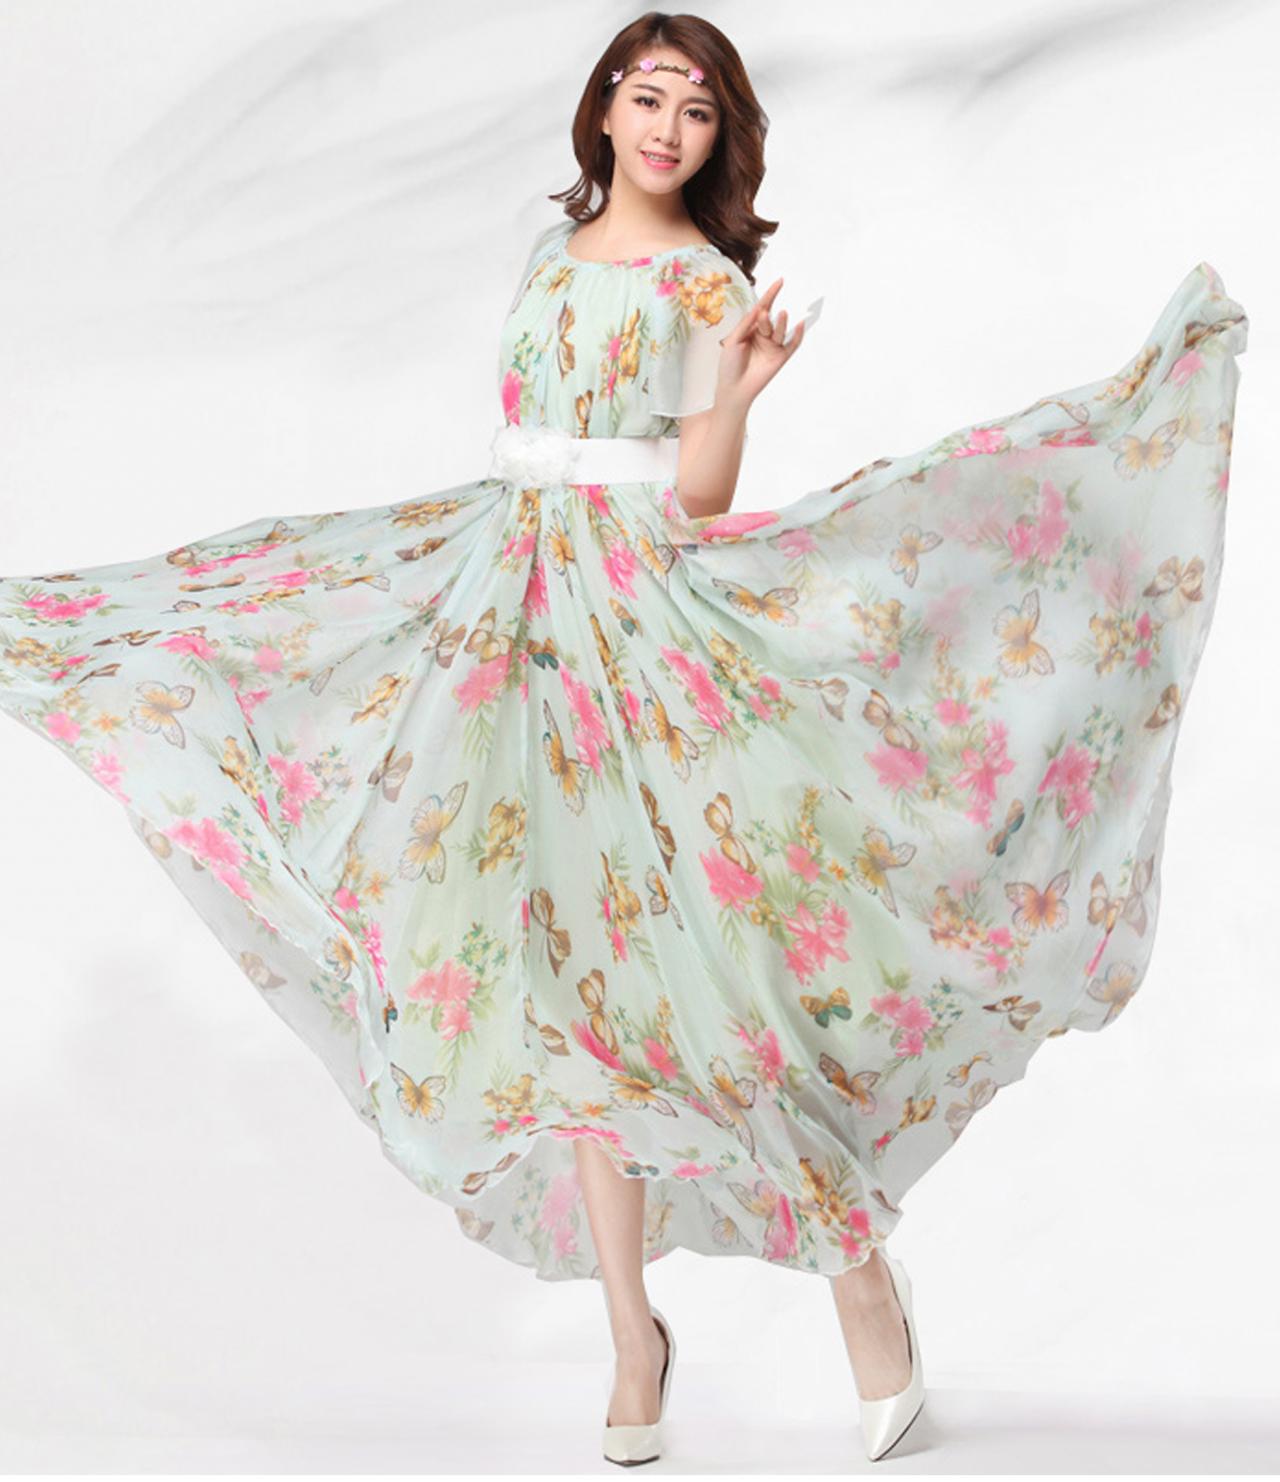 1e81ecc4c8b8 Chiffon Butterfly Sleeves Bridesmaid Holiday Beach Floral Maxi Dress Plus  Size Sundress